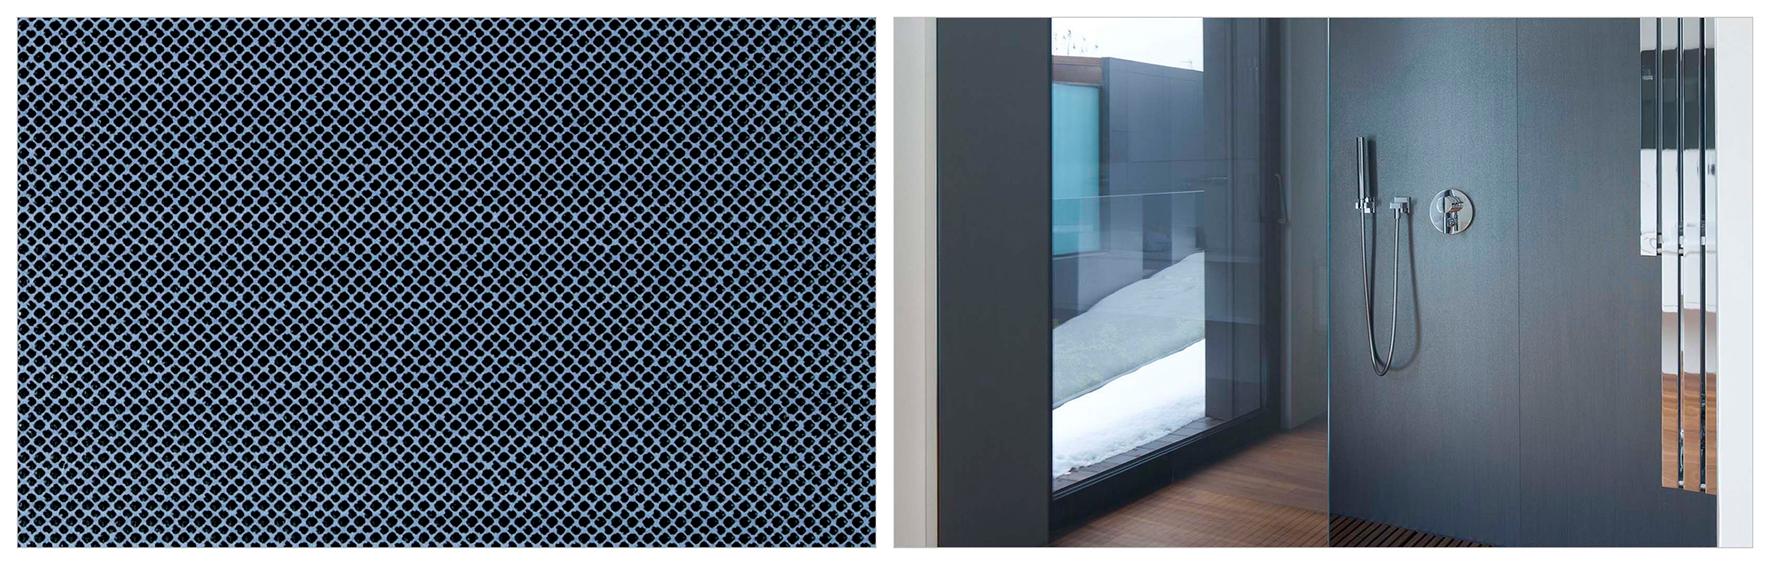 Filo-Mercurio-1000x3000x3mm